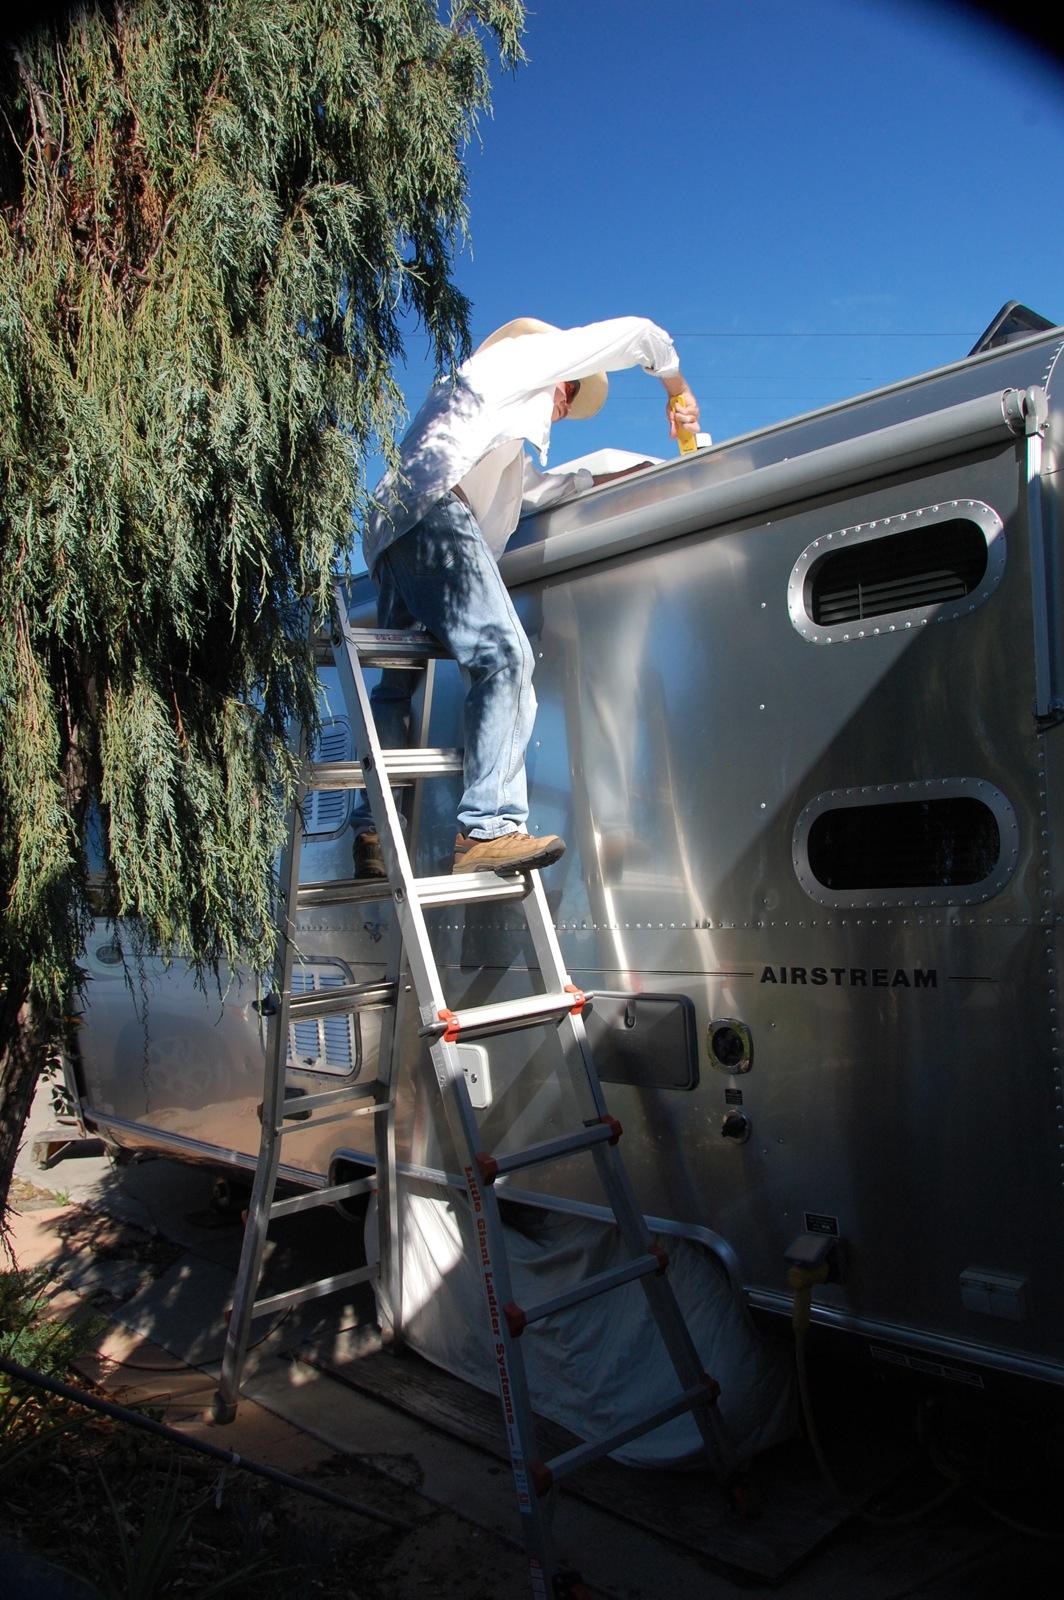 Resealing Airstream plumbing vent - Airstream Forums